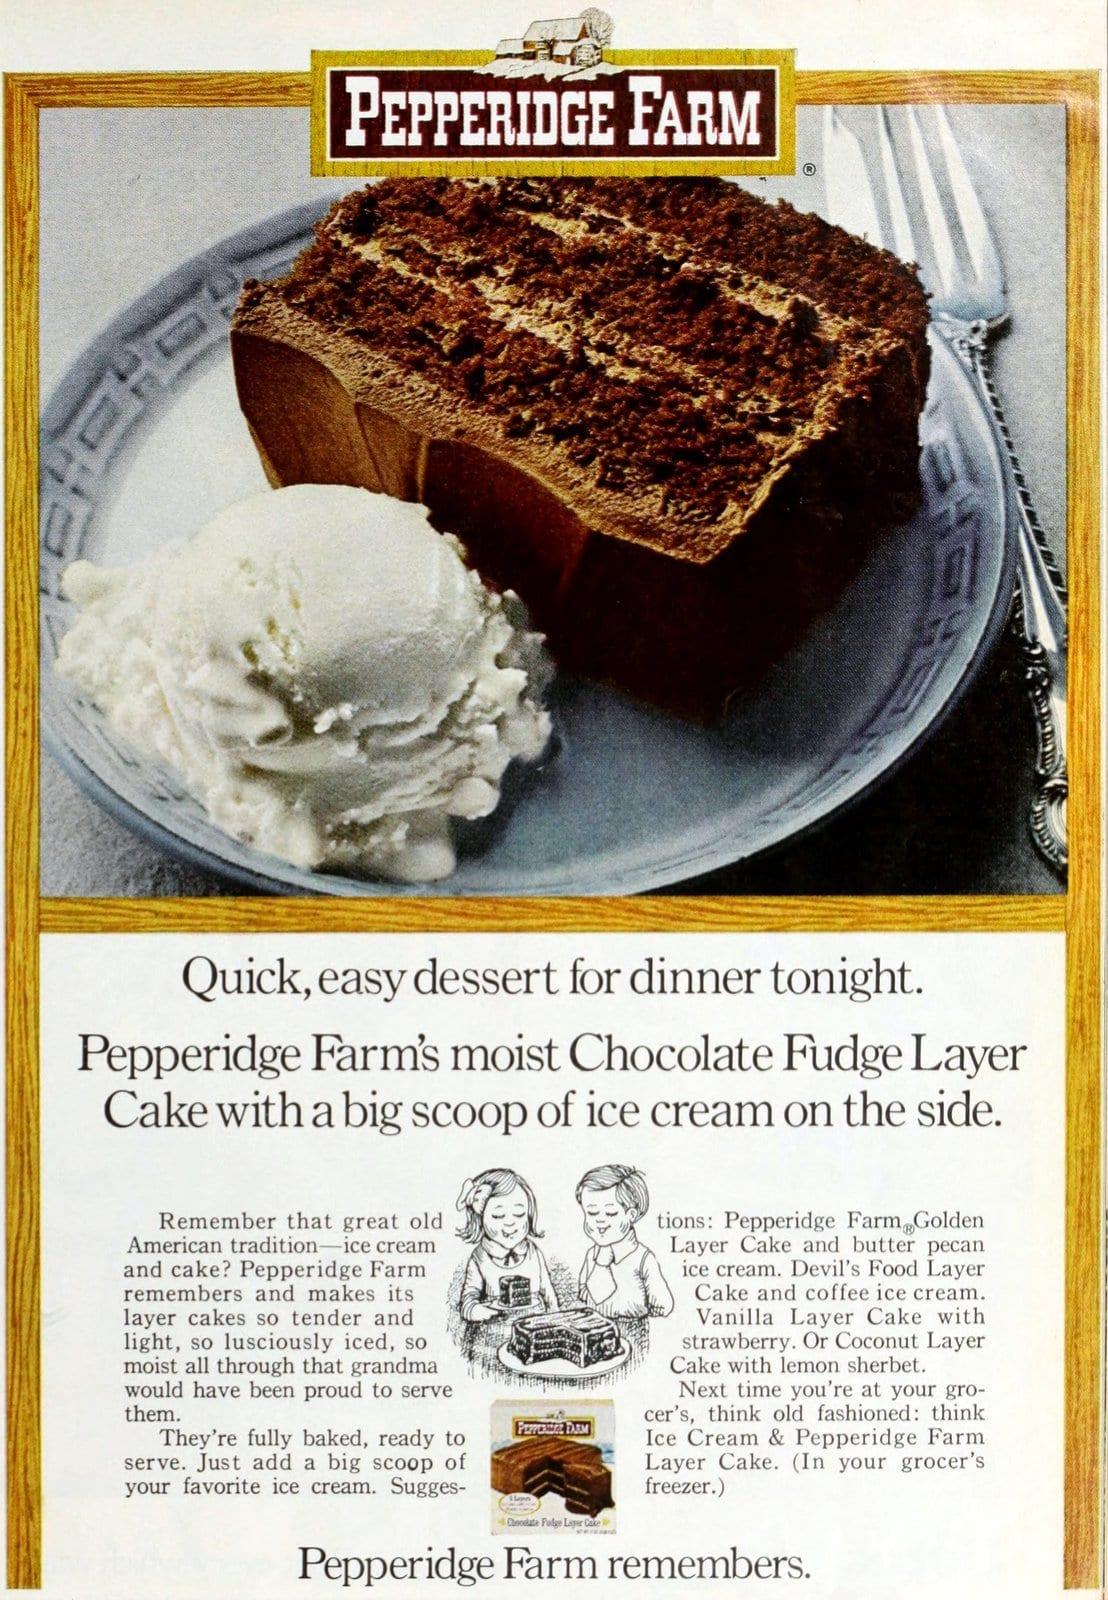 Pepperidge Farm vintage Chocolate Fudge Layer Cake (1972)